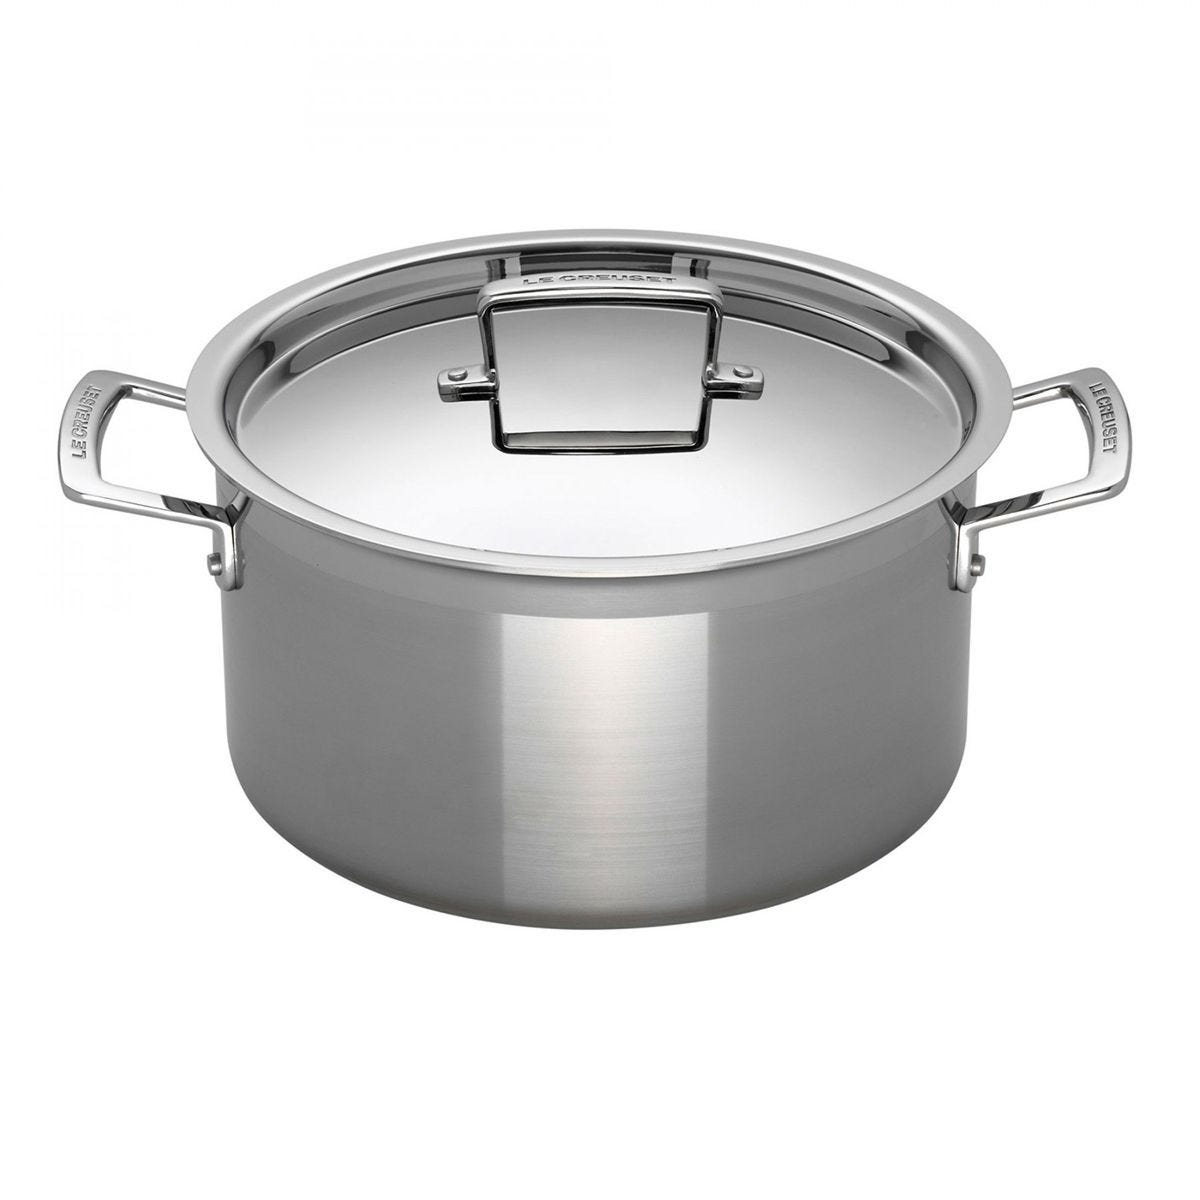 Le Creuset 3-Ply Stainless Steel Deep Casserole 20cm